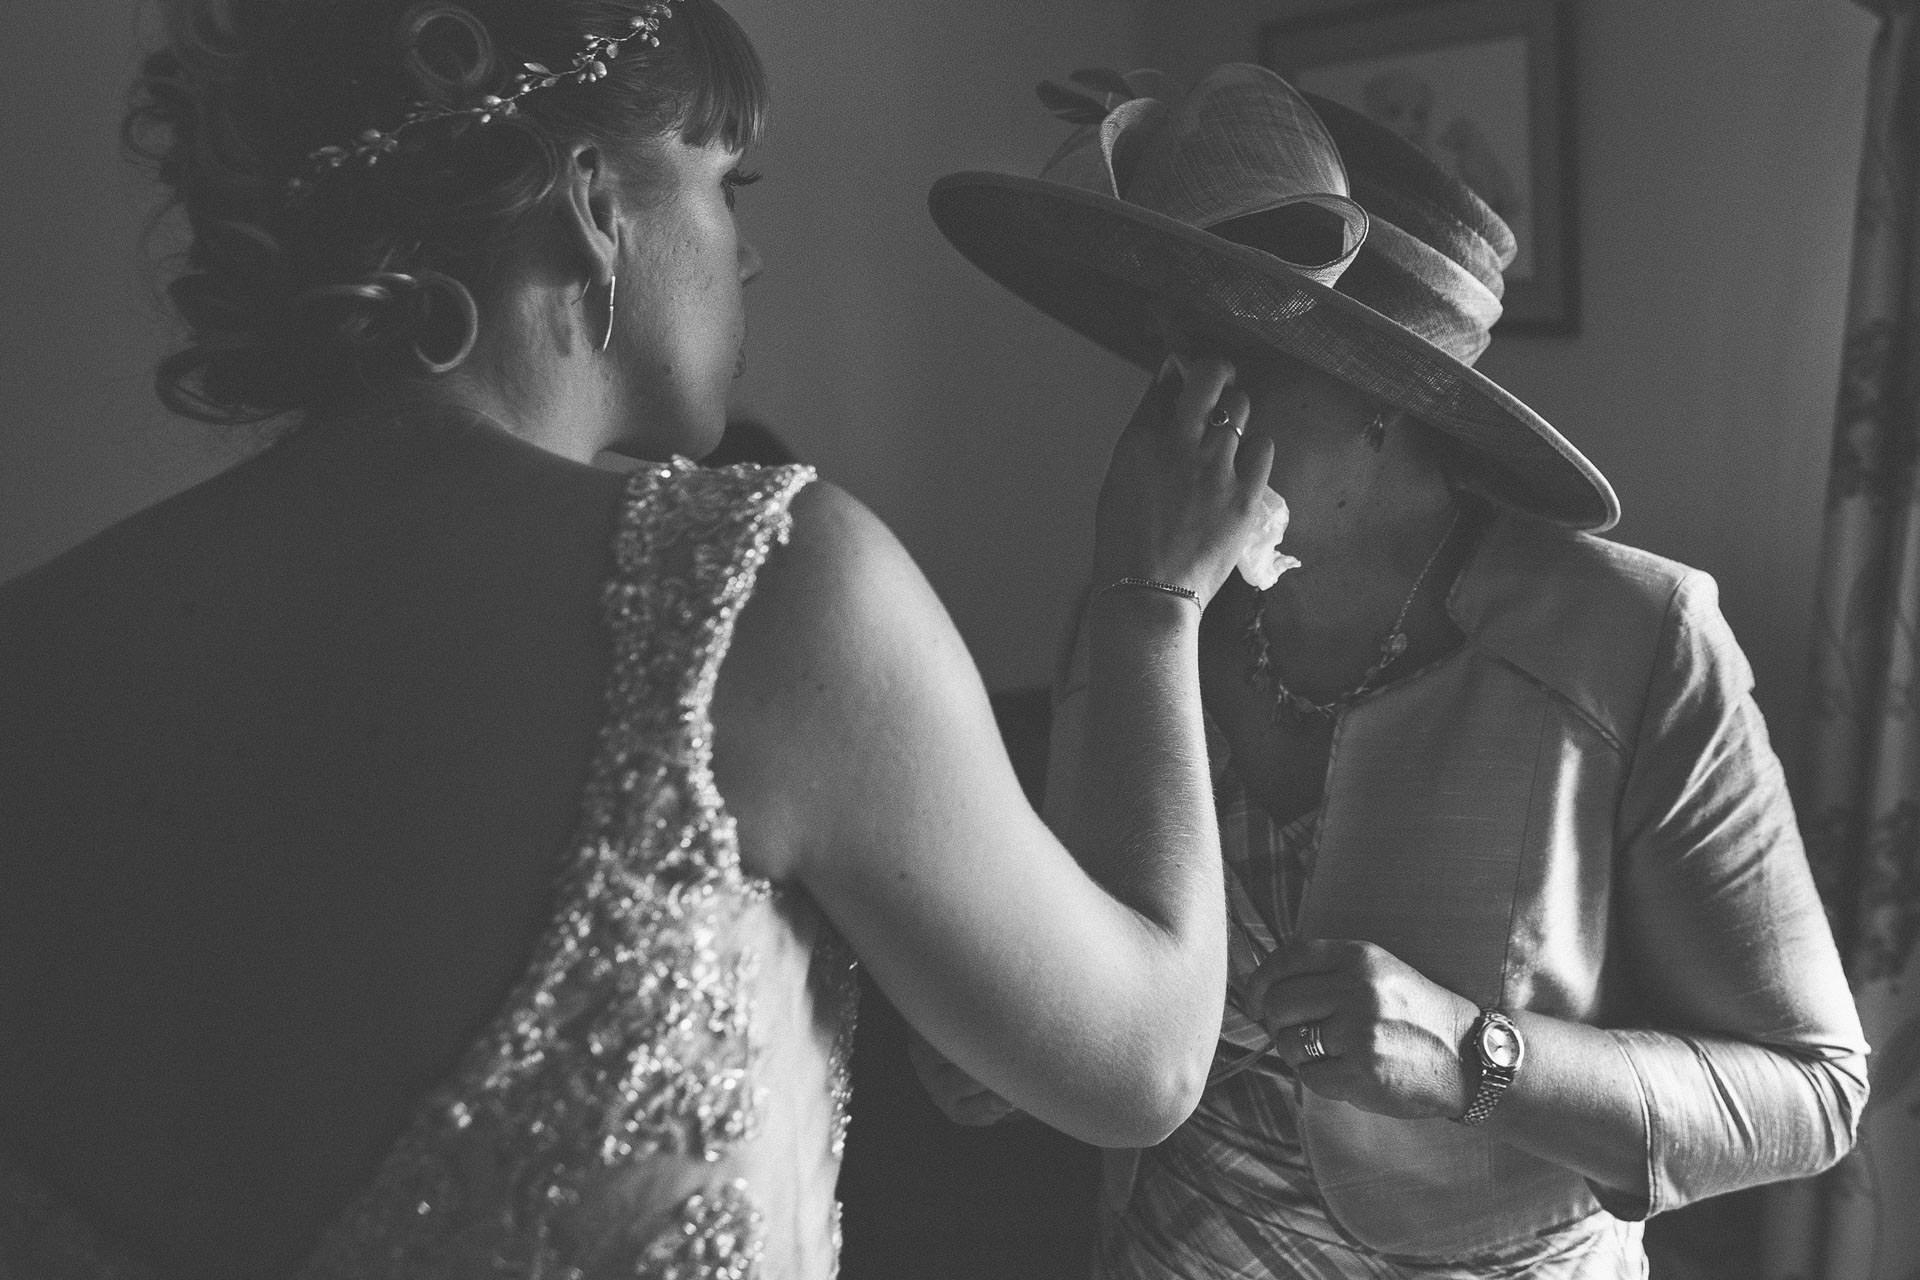 cheshire-rustic-farm-wedding-photography-helen-simon-29